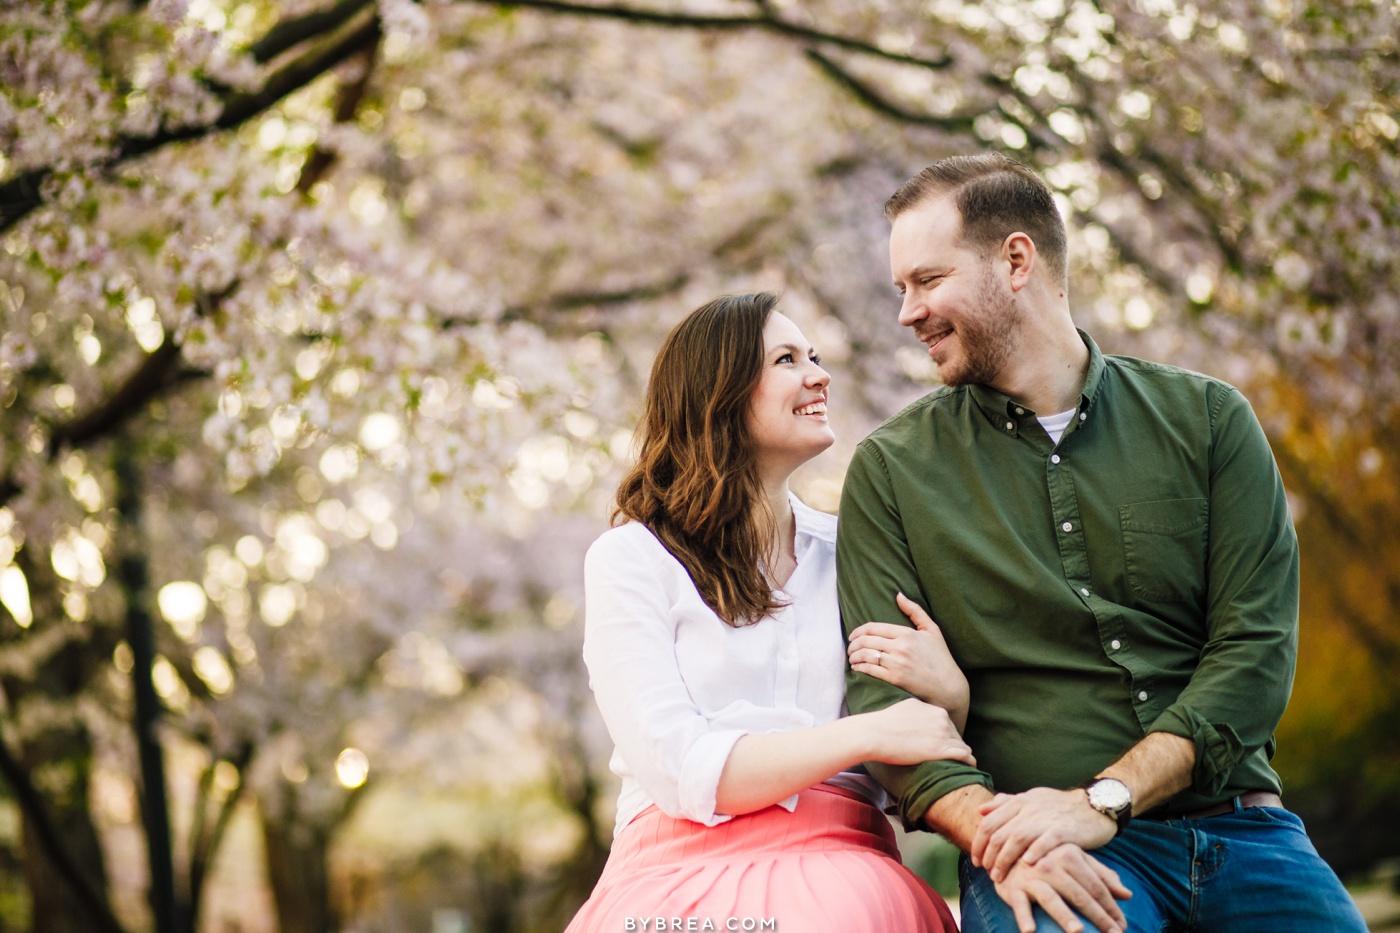 cherry blossom dating login